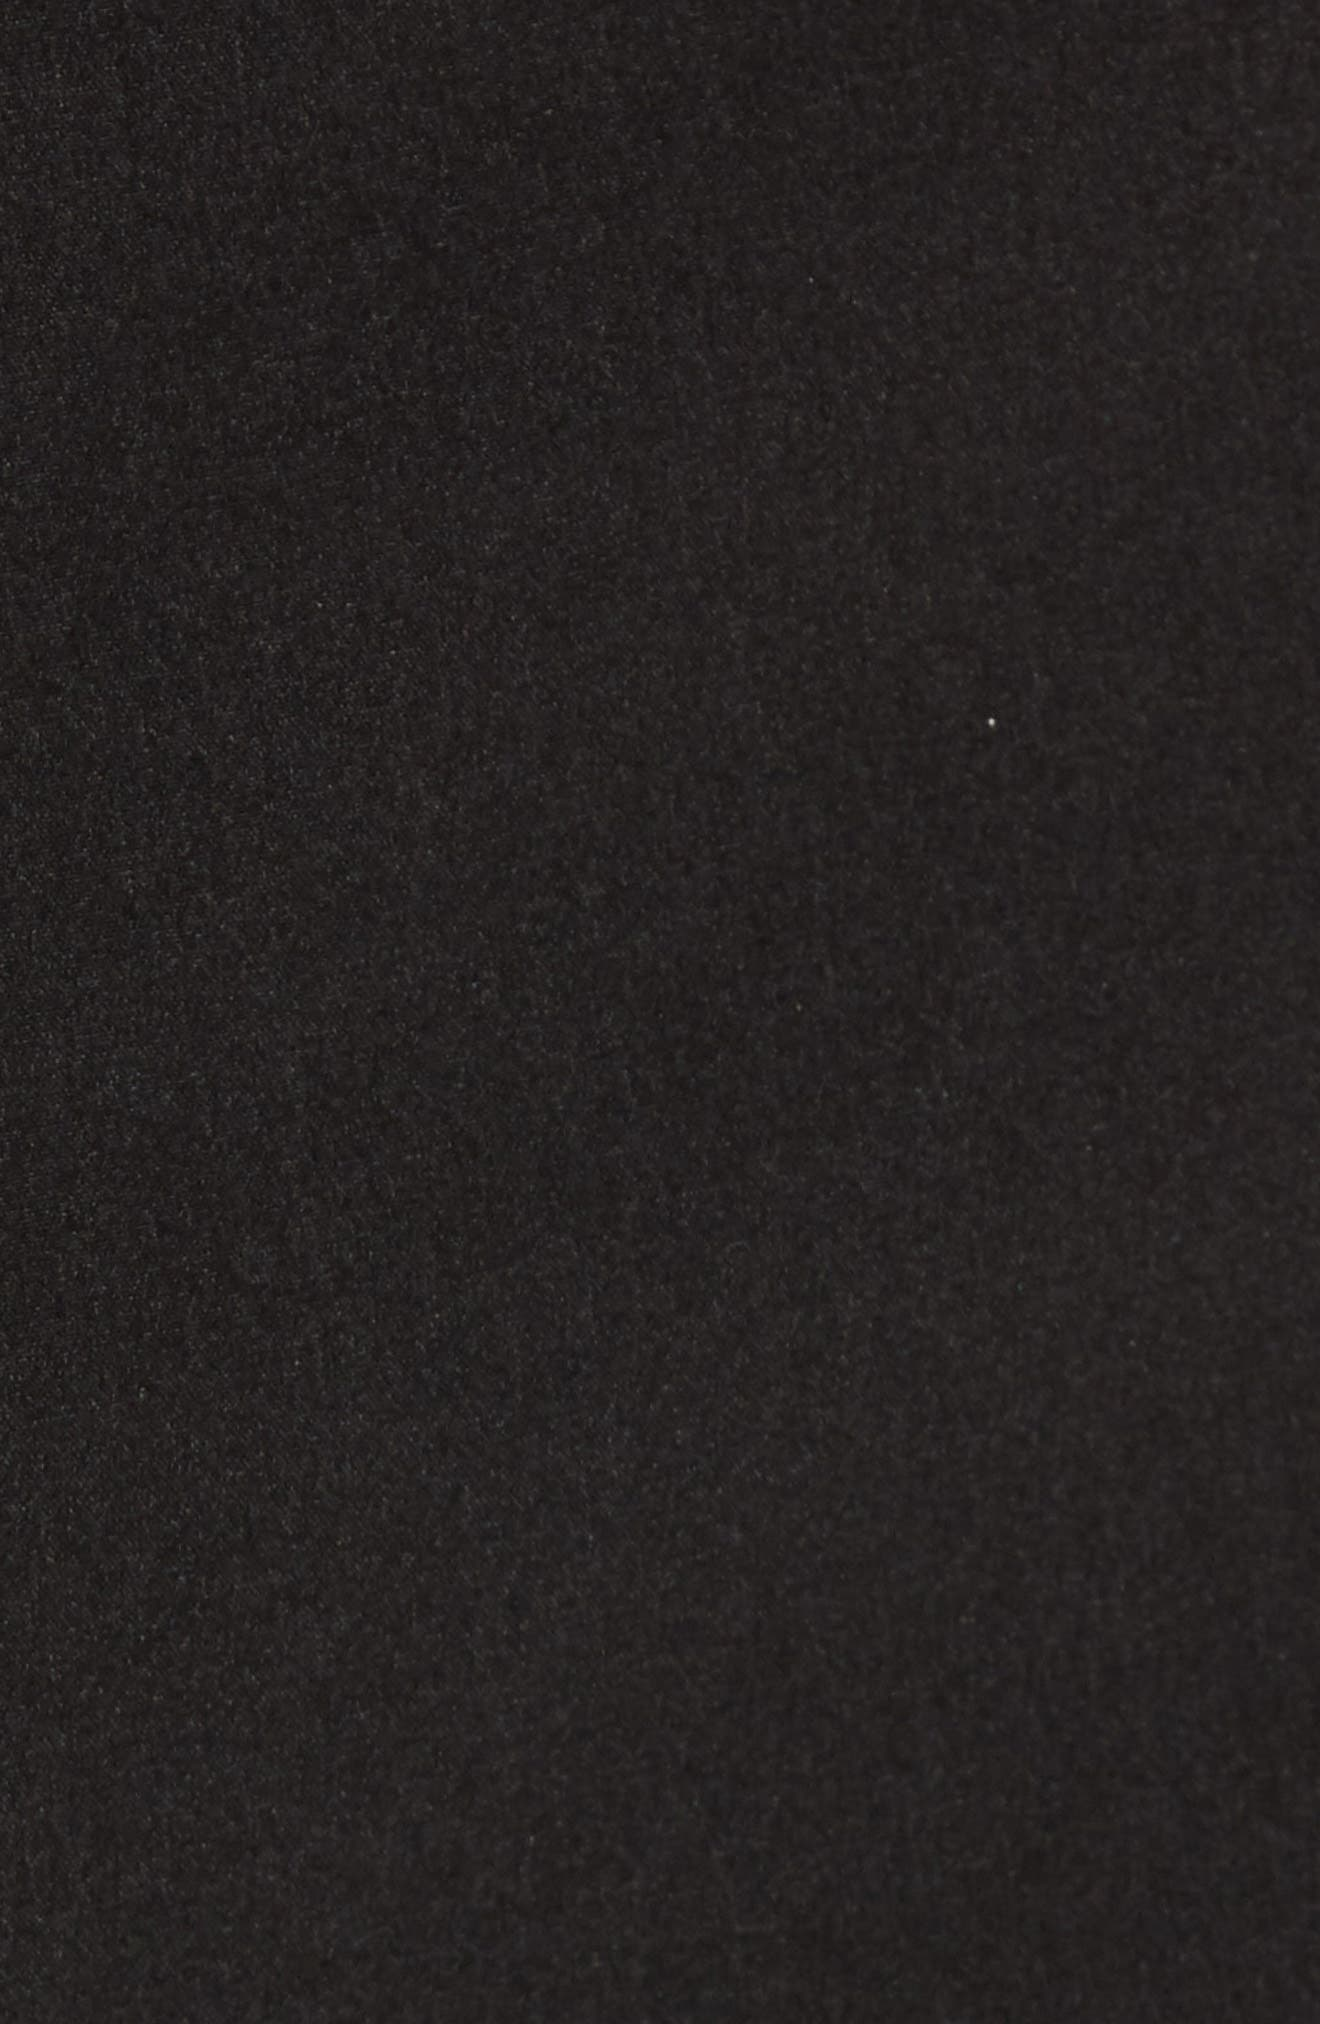 Danny Board Shorts,                             Alternate thumbnail 5, color,                             Black